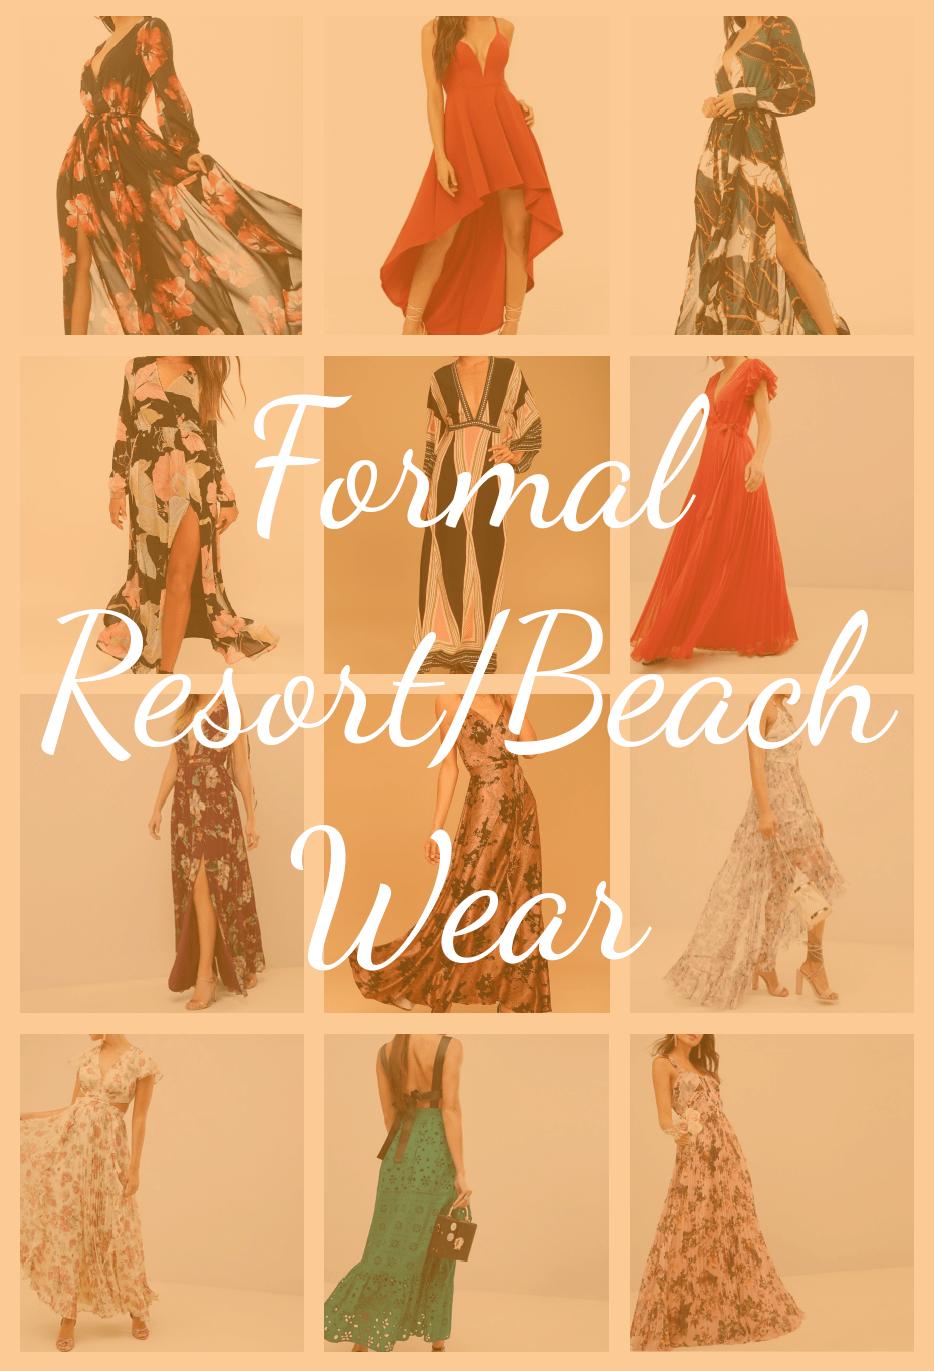 Resort and Beach Dresses